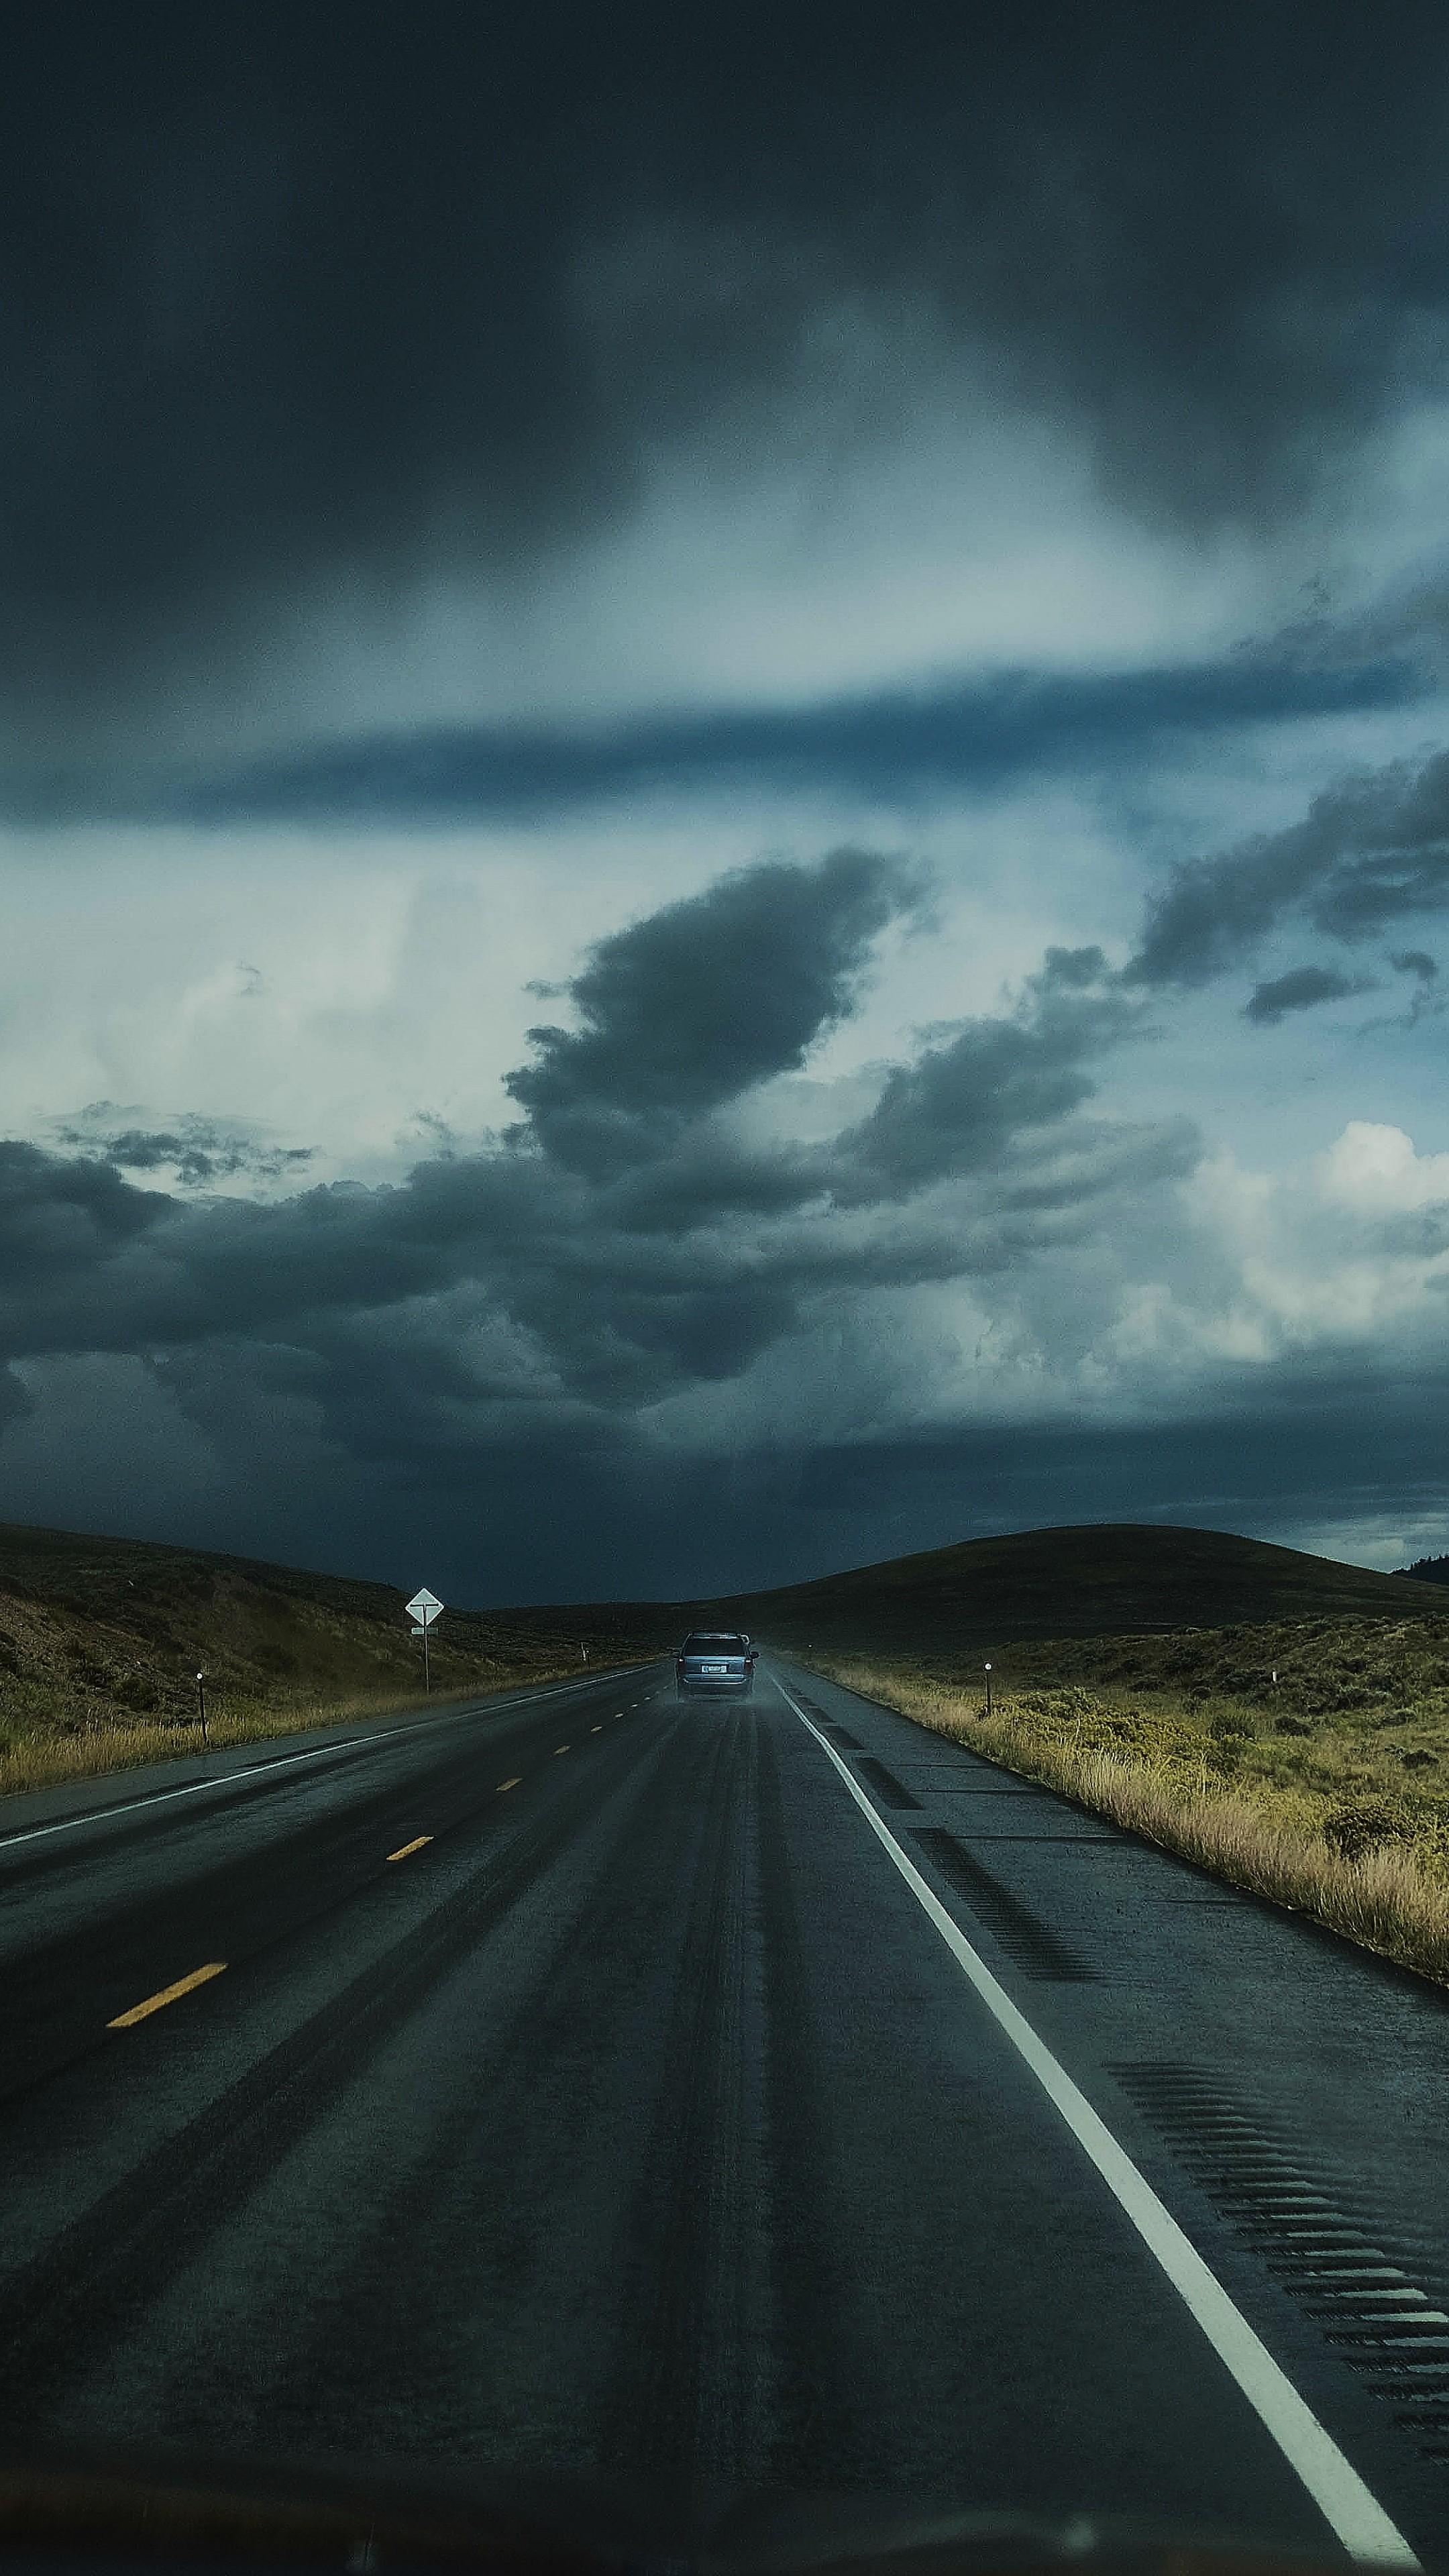 Road Clouds Auto Traffic Wallpaper 2160x3840